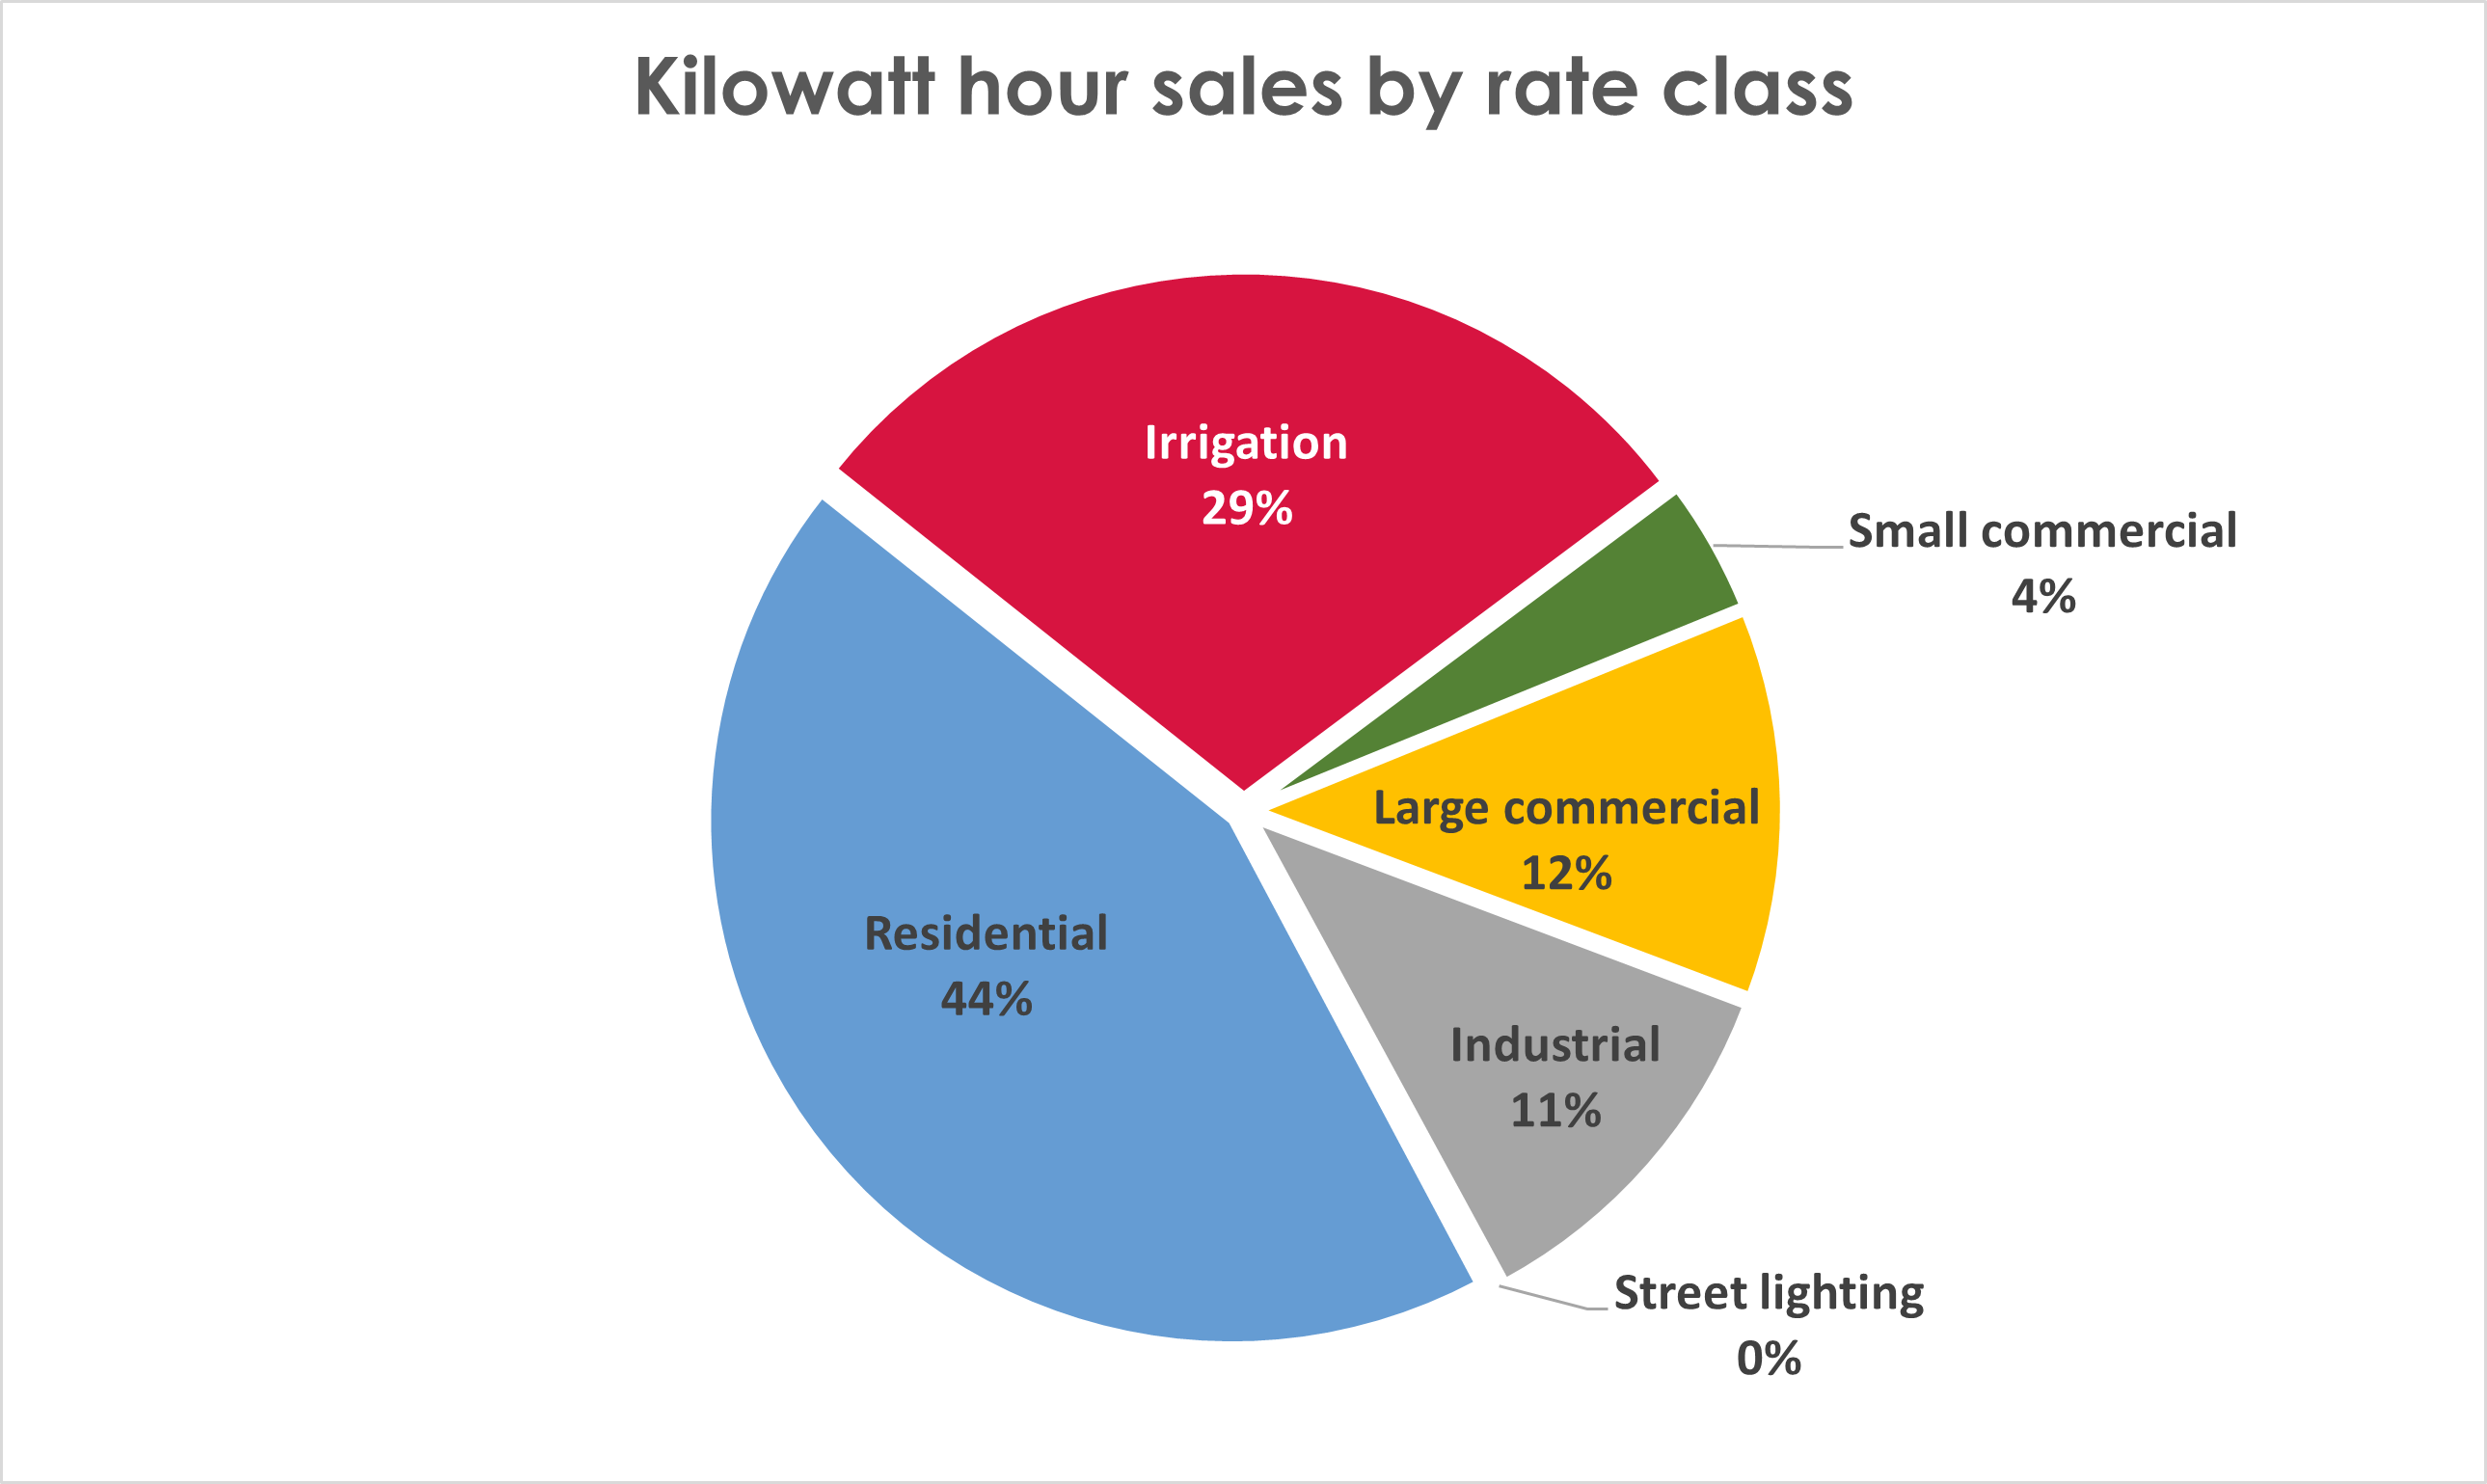 Kilowatt hour sales by rate class